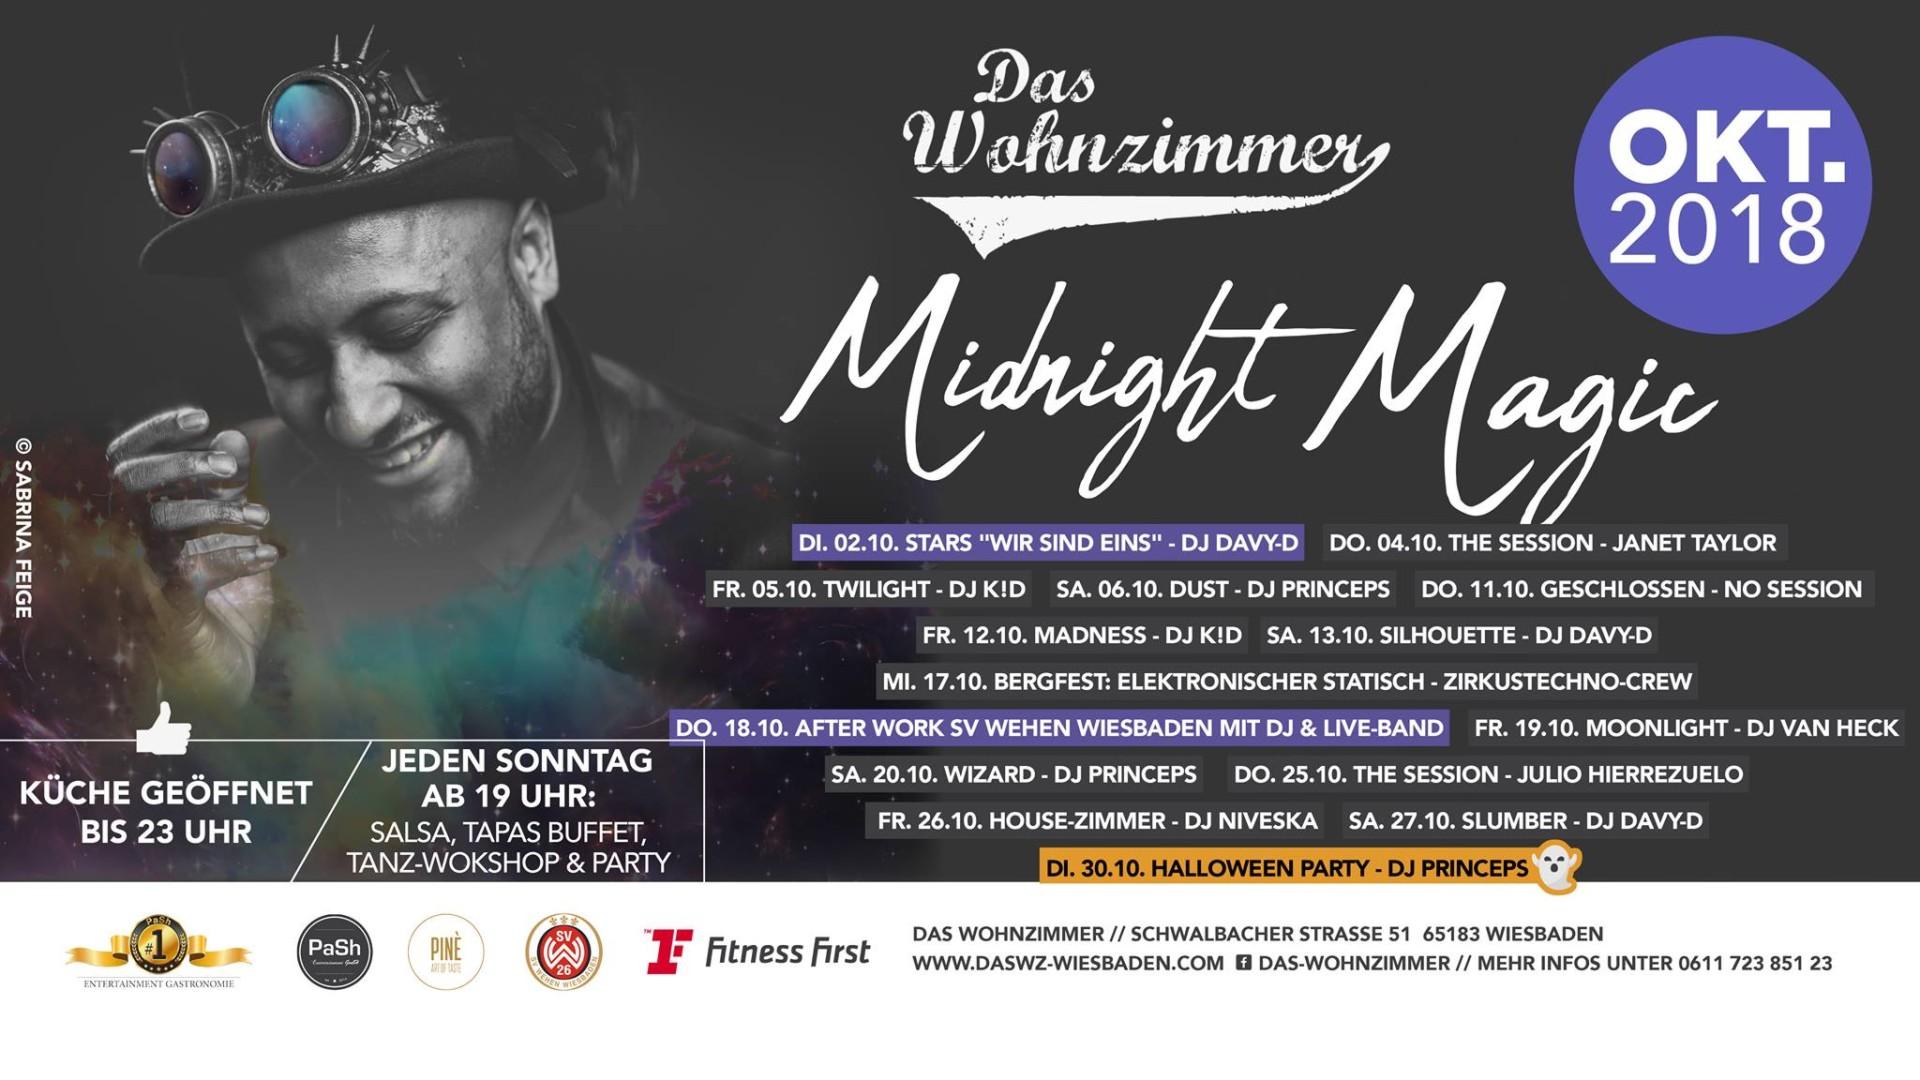 19102018 Midnight Magic Moonlight With Dj Van Heck Das